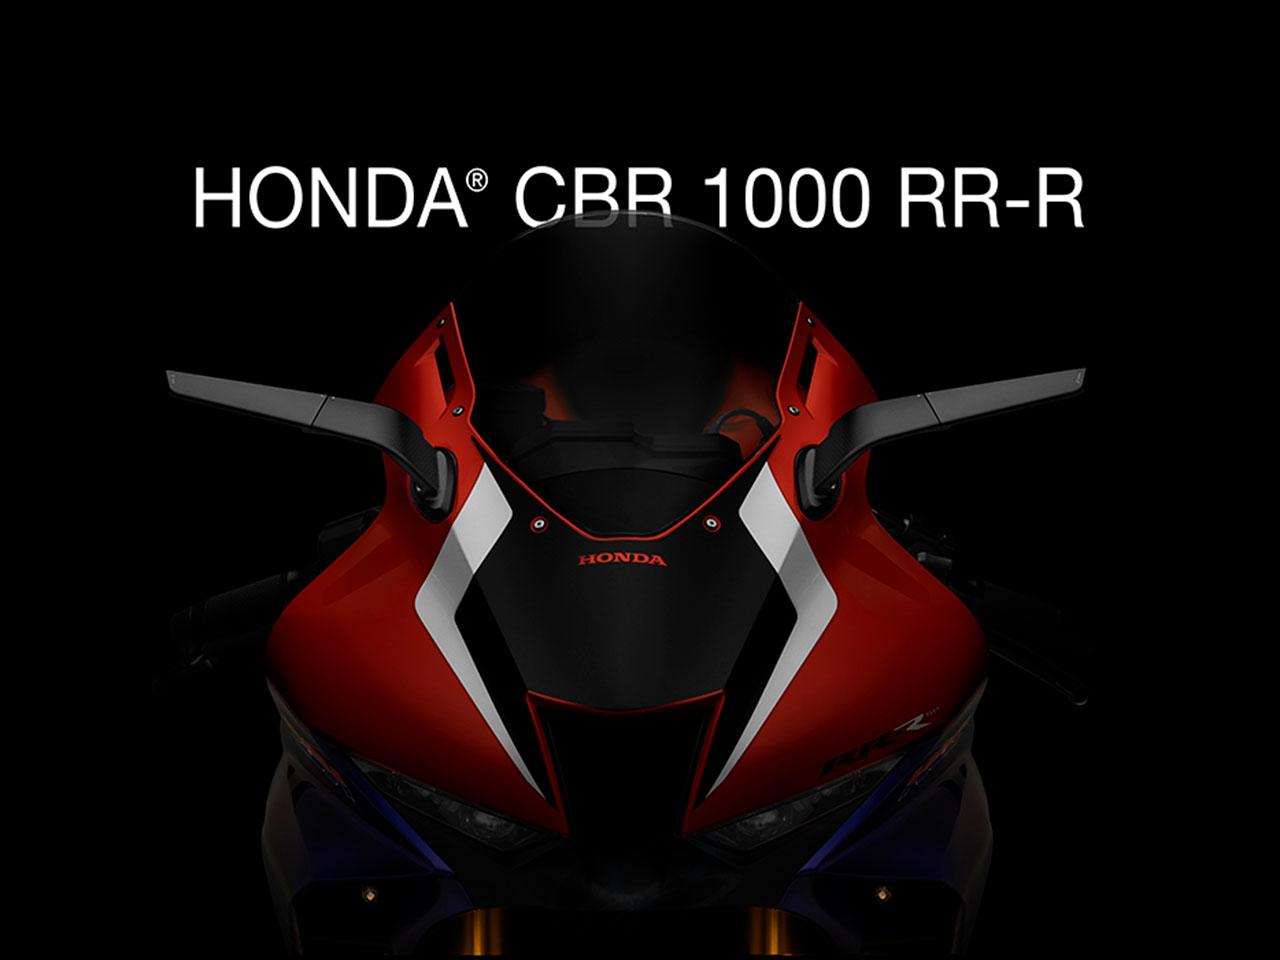 rizoma / リゾマ ミラー 「ステルス / STEALTH」HONDA CBR 1000RR-R Fireblade SP